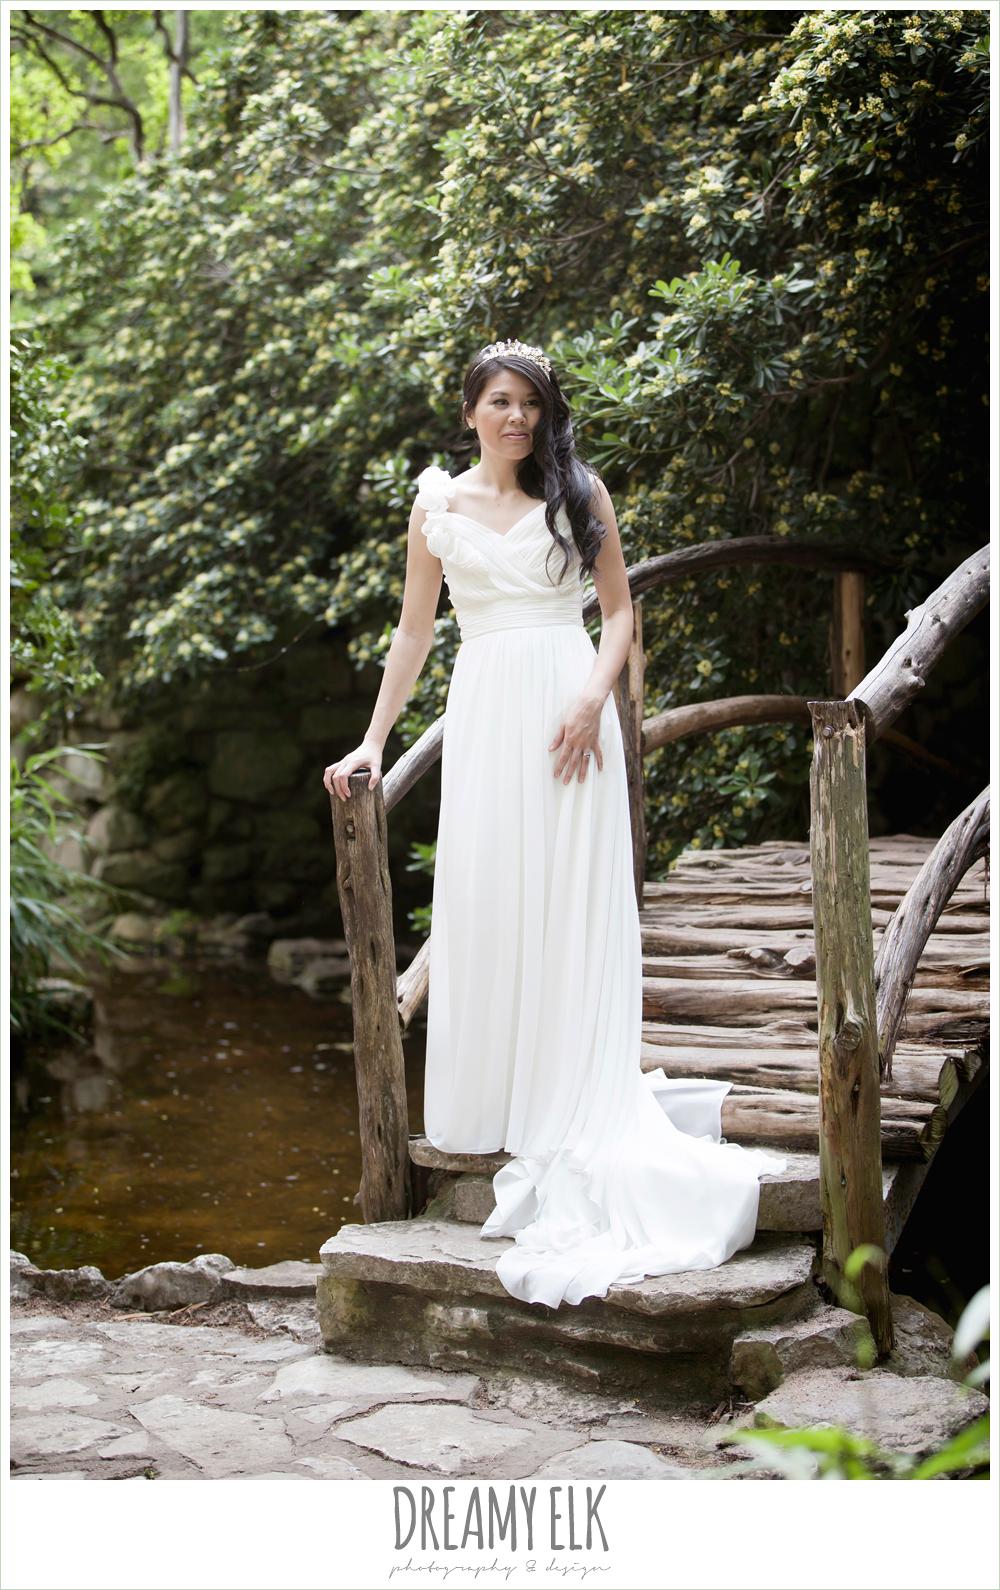 Wedding Dresses S In Austin Tx : Jennifer bridals zilker botanical gardens austin texas